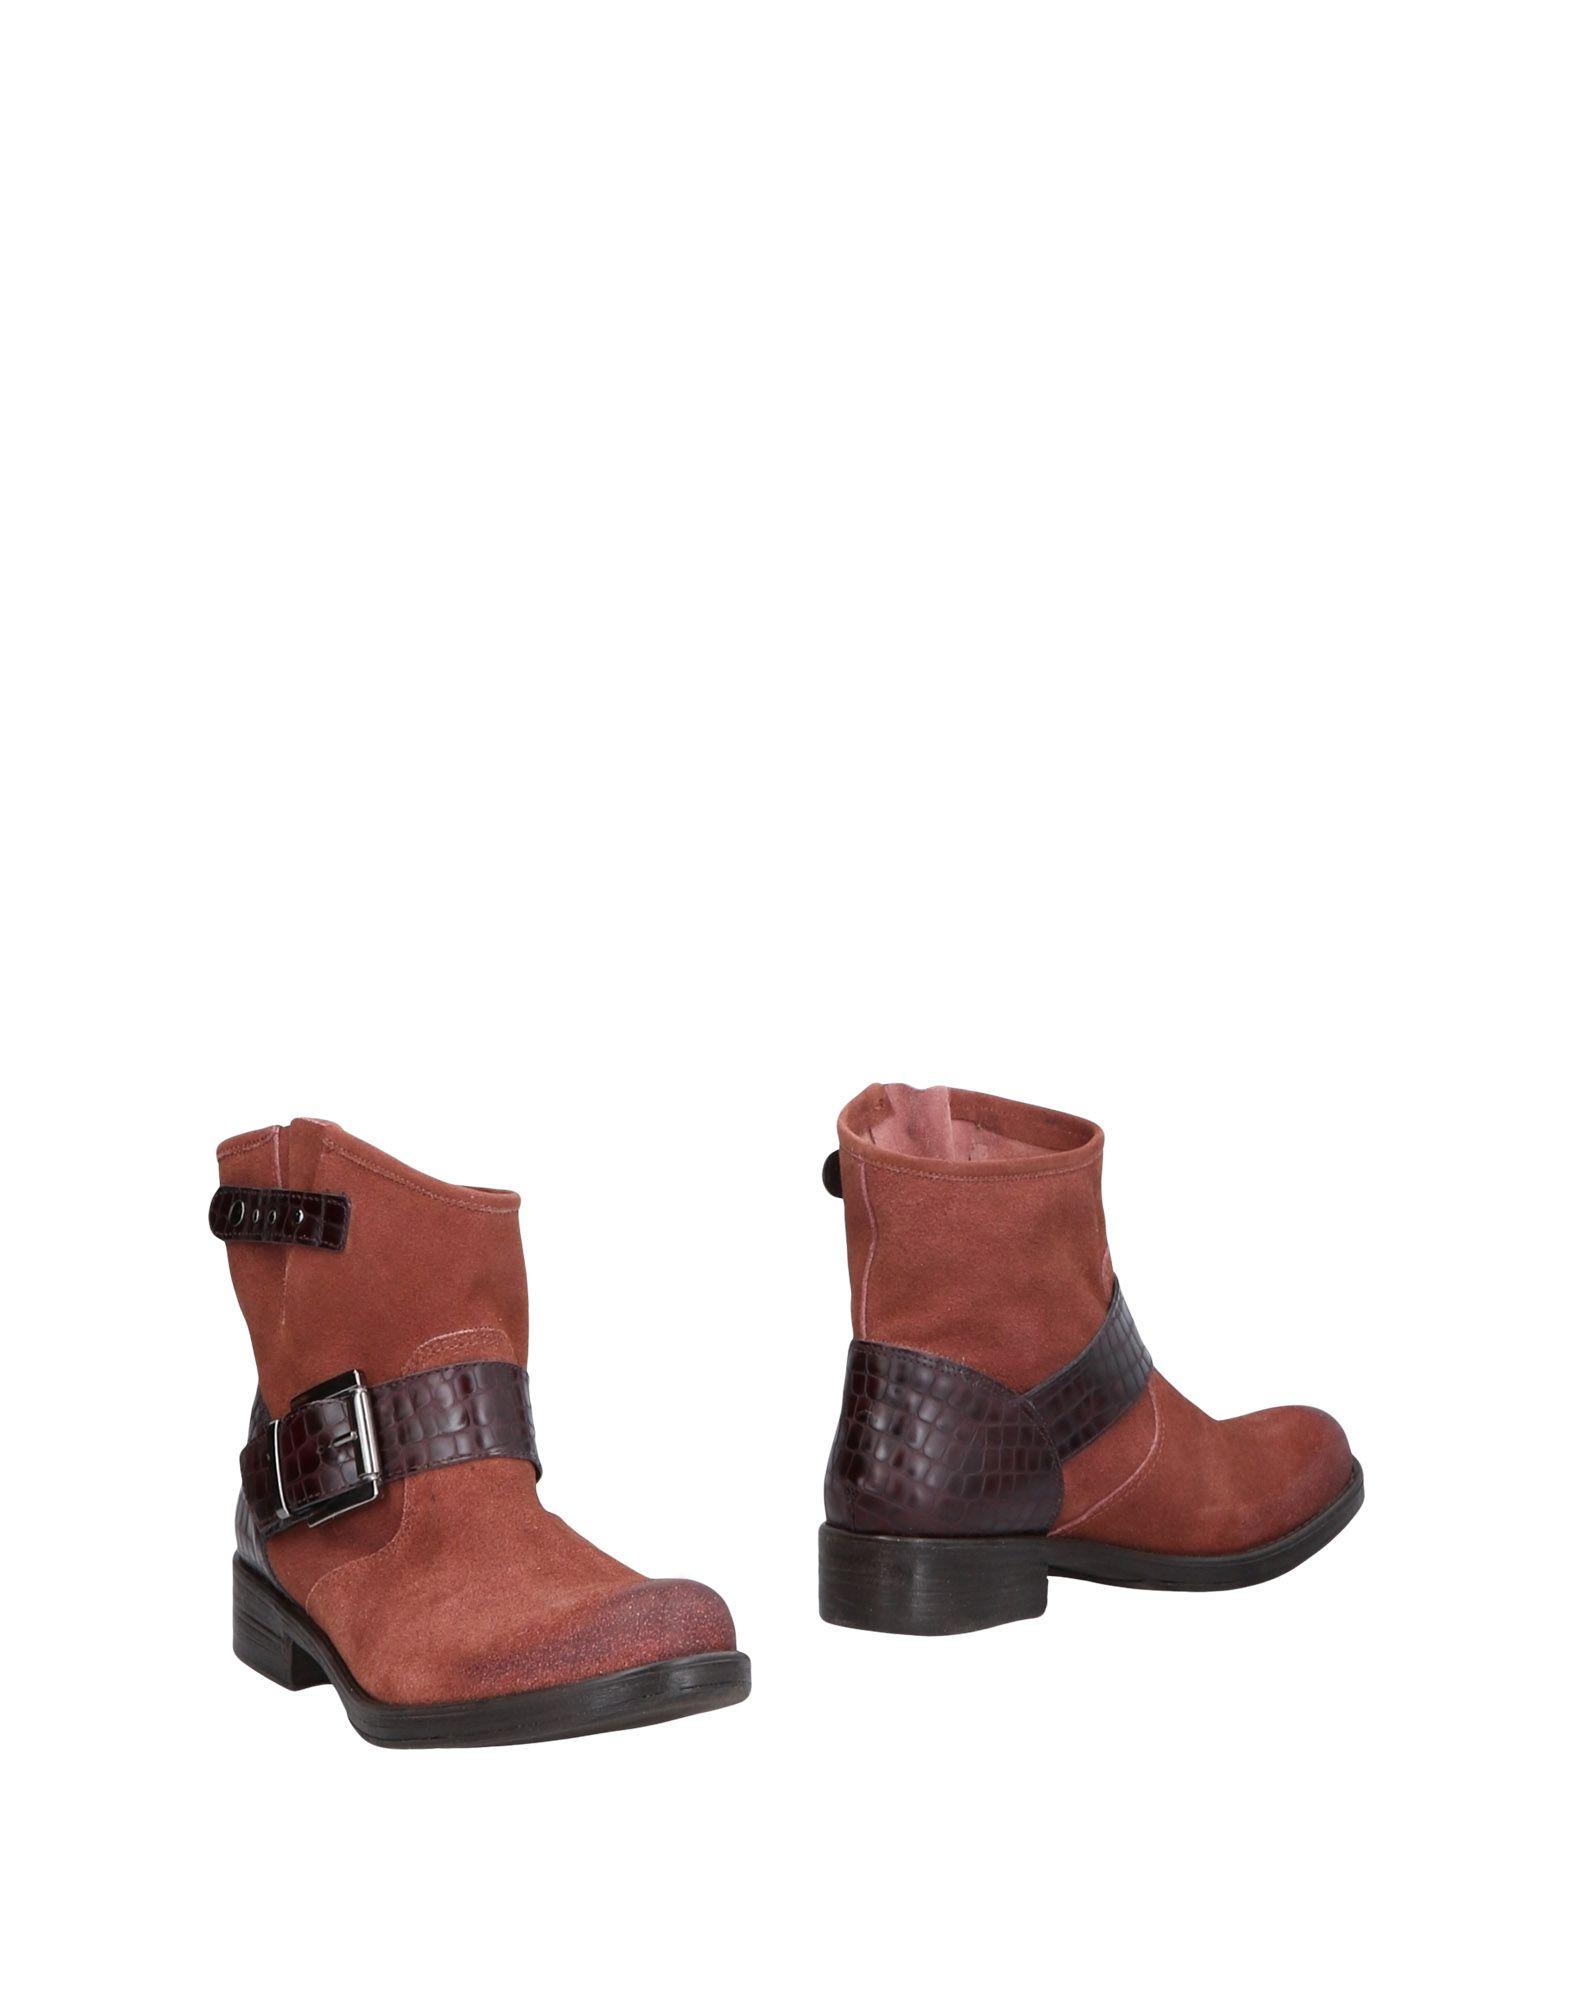 Tsd12 Stiefelette Damen  11454122LV 11454122LV 11454122LV Gute Qualität beliebte Schuhe 69373f